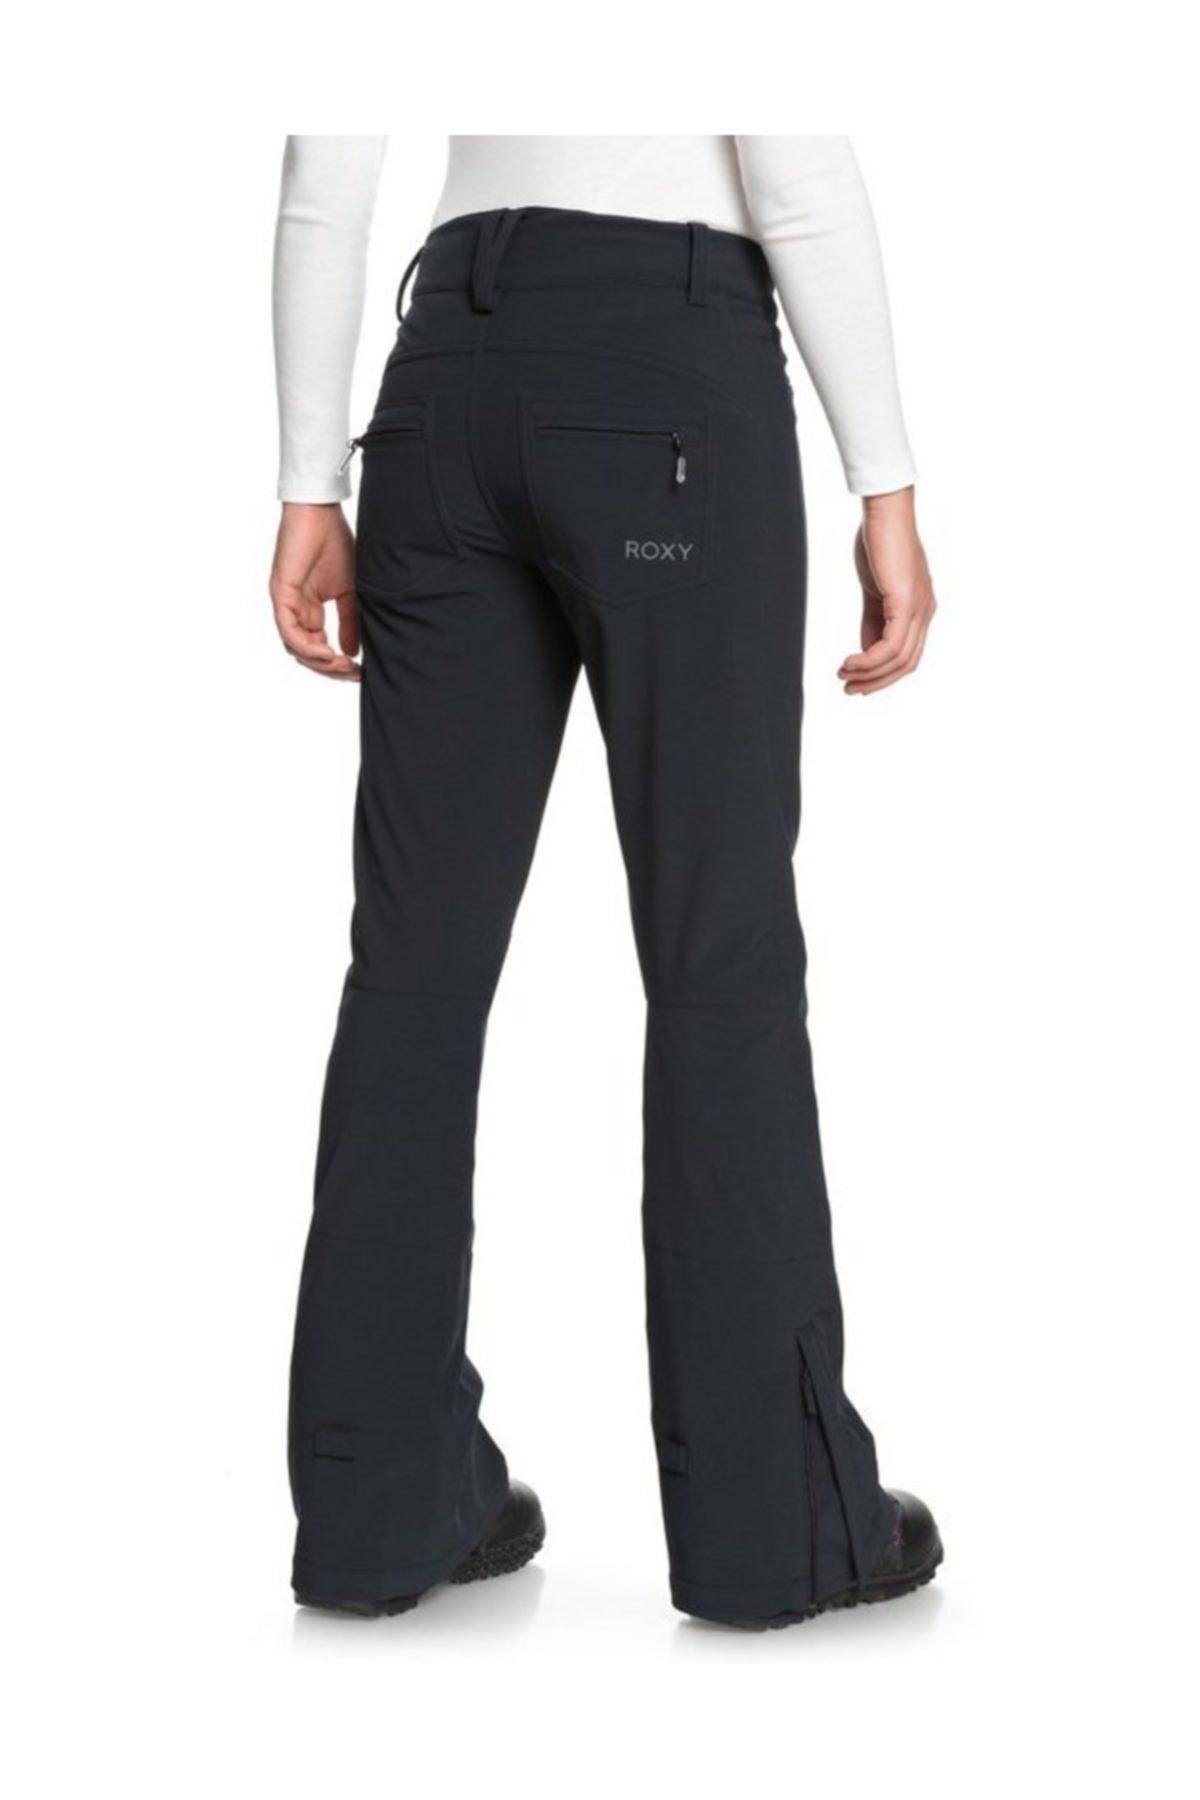 Roxy Creek Snow Kadın Pantolon ERJTP03060 2